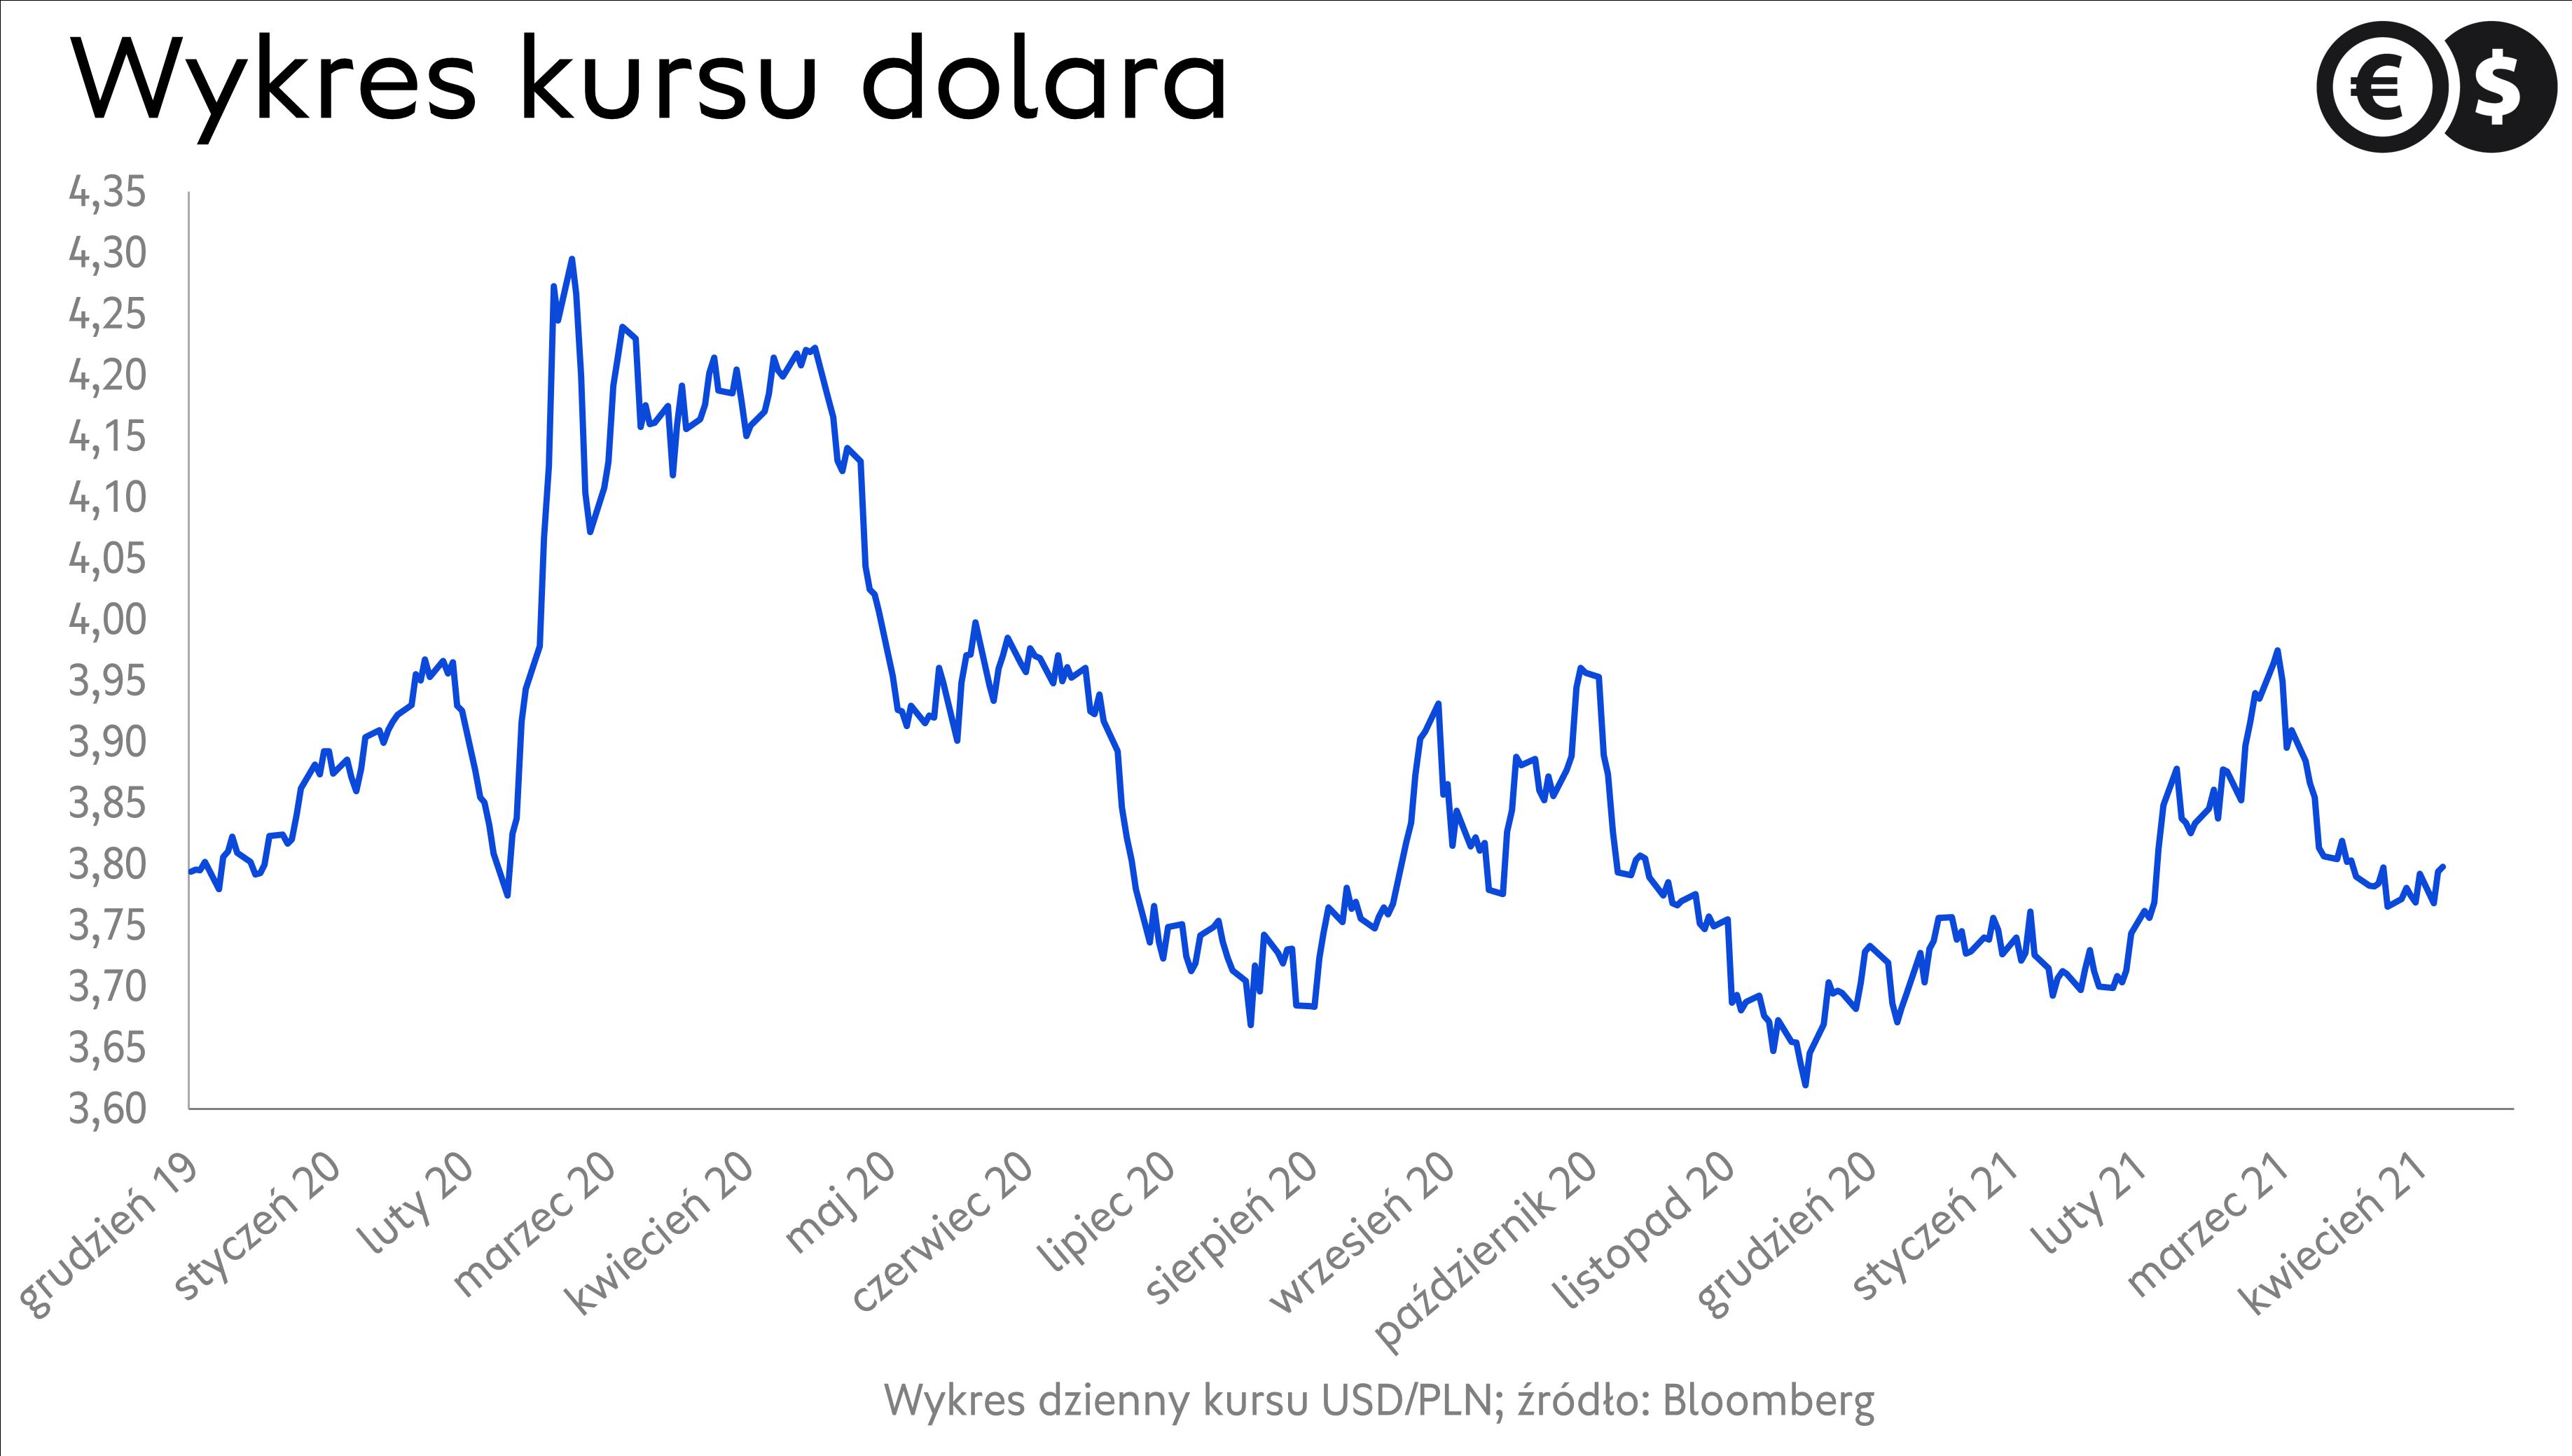 Kurs dolara, notowania USD/PLN; źródło: Bloomberg